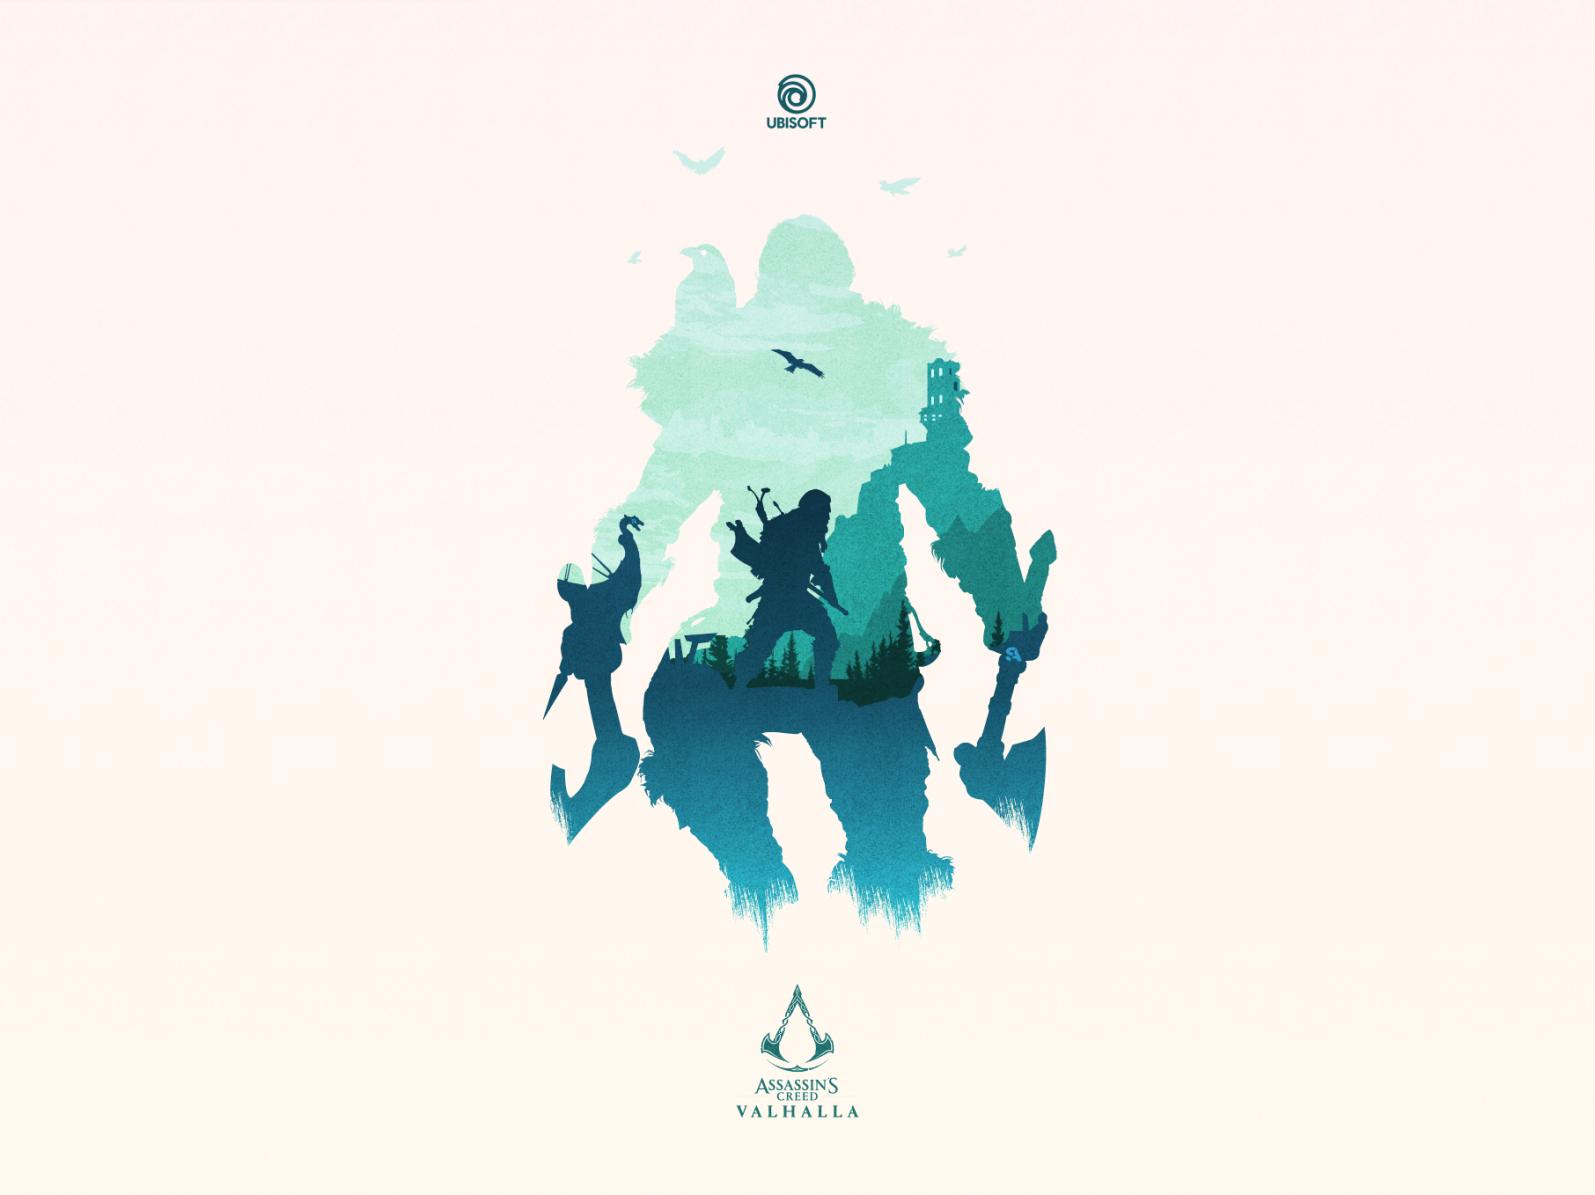 Assassins Creed Valhalla Best Assassin S Creed Assassins Creed Assassin S Creed